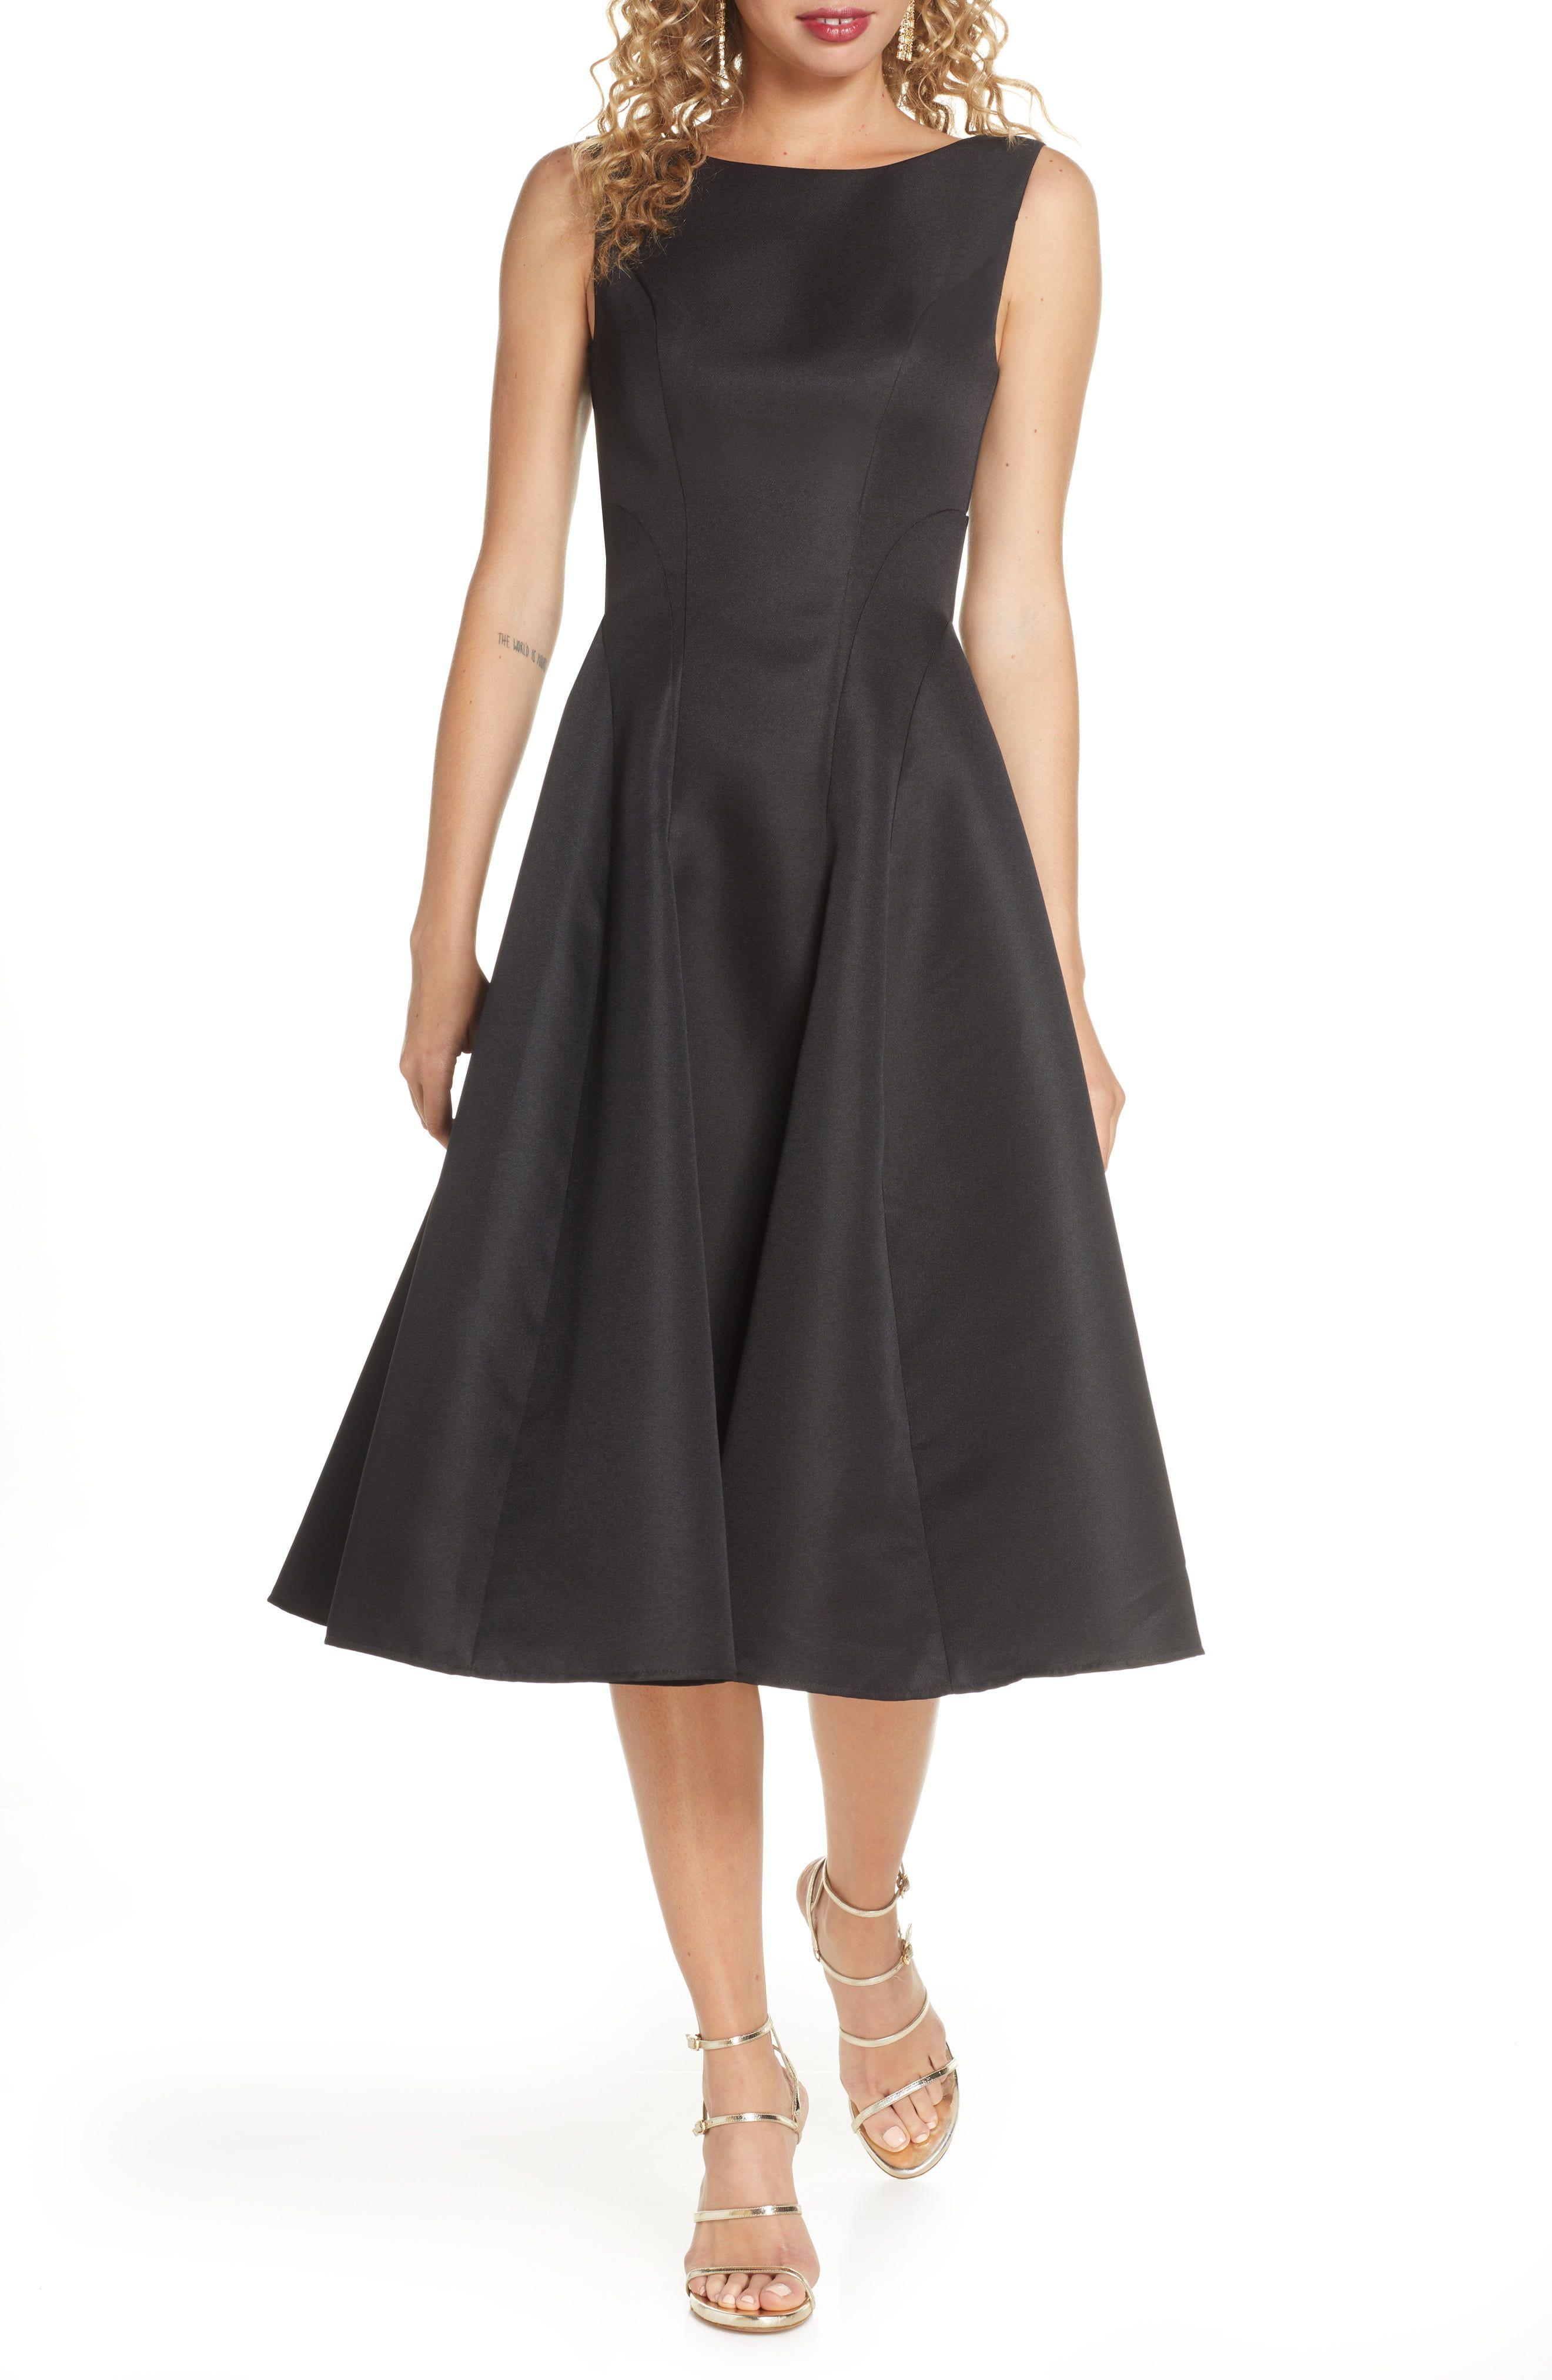 Chi Chi London Ellie Fit Flare Cocktail Dress Nordstrom Fit And Flare Cocktail Dress Dresses Fashion Clothes Women [ 4048 x 2640 Pixel ]